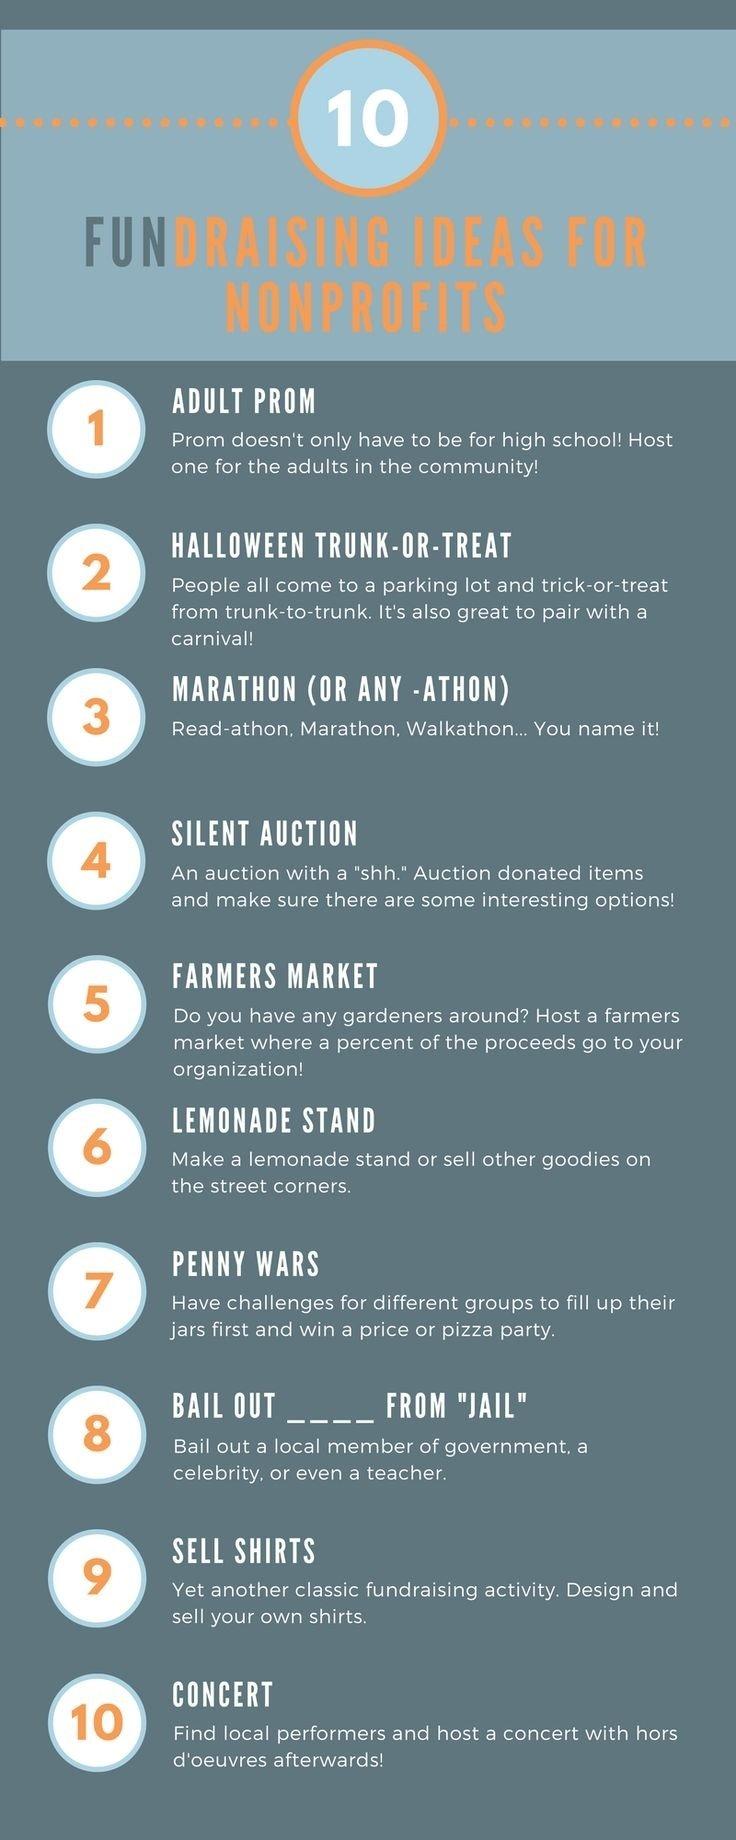 10 Spectacular Fundraising Ideas For Non Profit Organizations 50 nonprofit fundraising ideas fundraising ideas fundraising and 1 2020